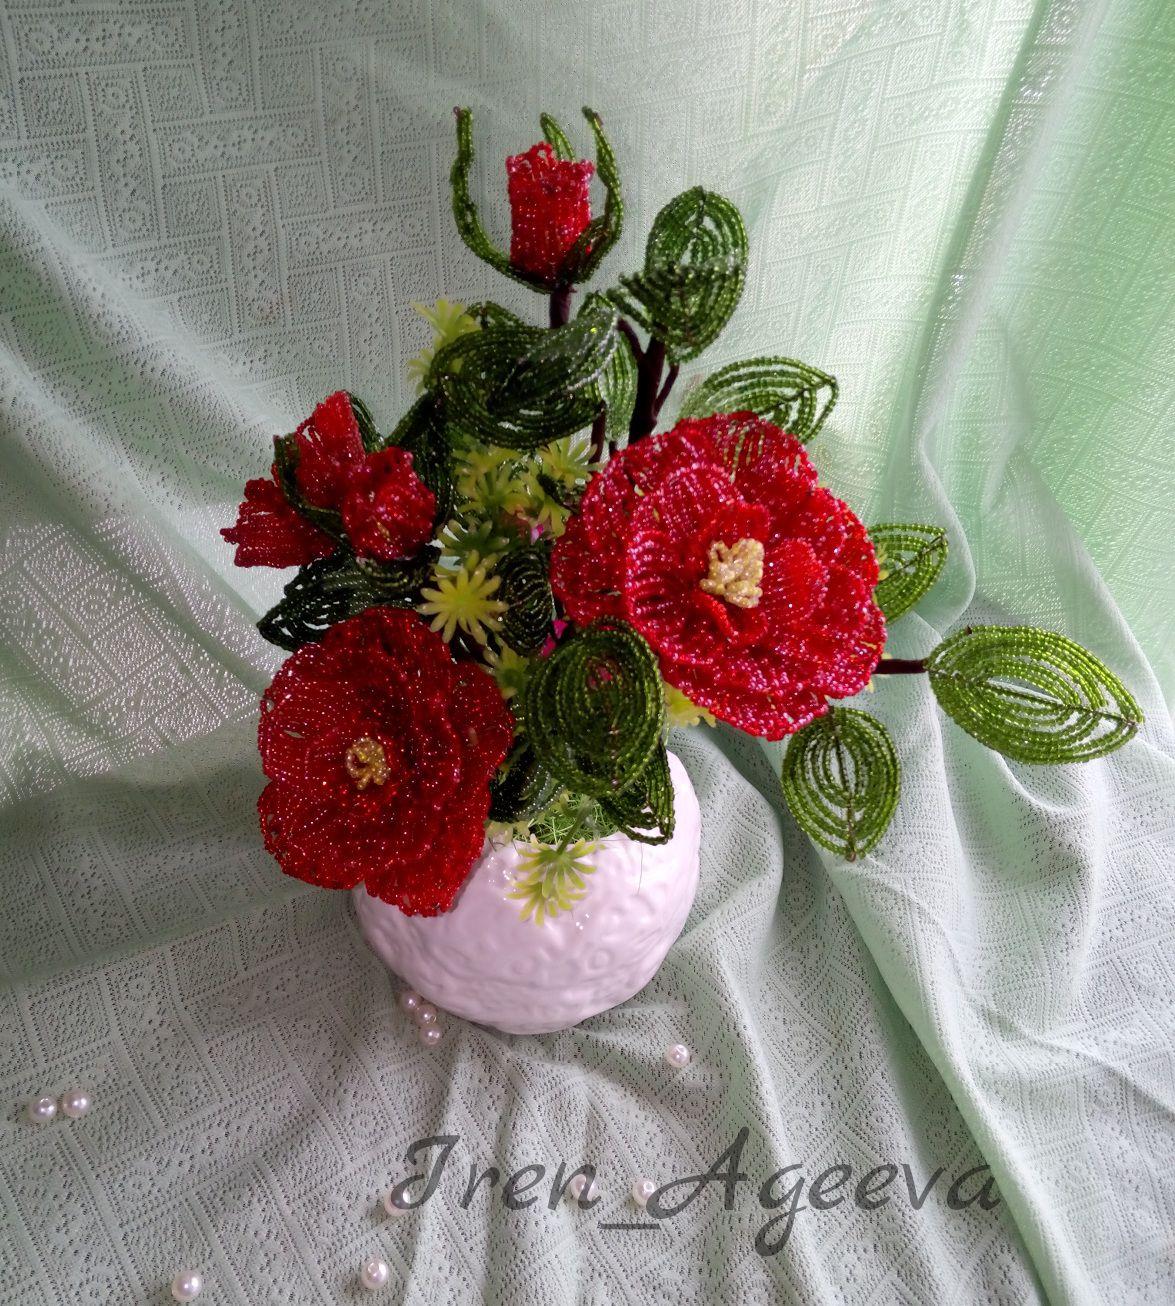 цветы подарок праздник юбилей бисер камелия ручнаяработа